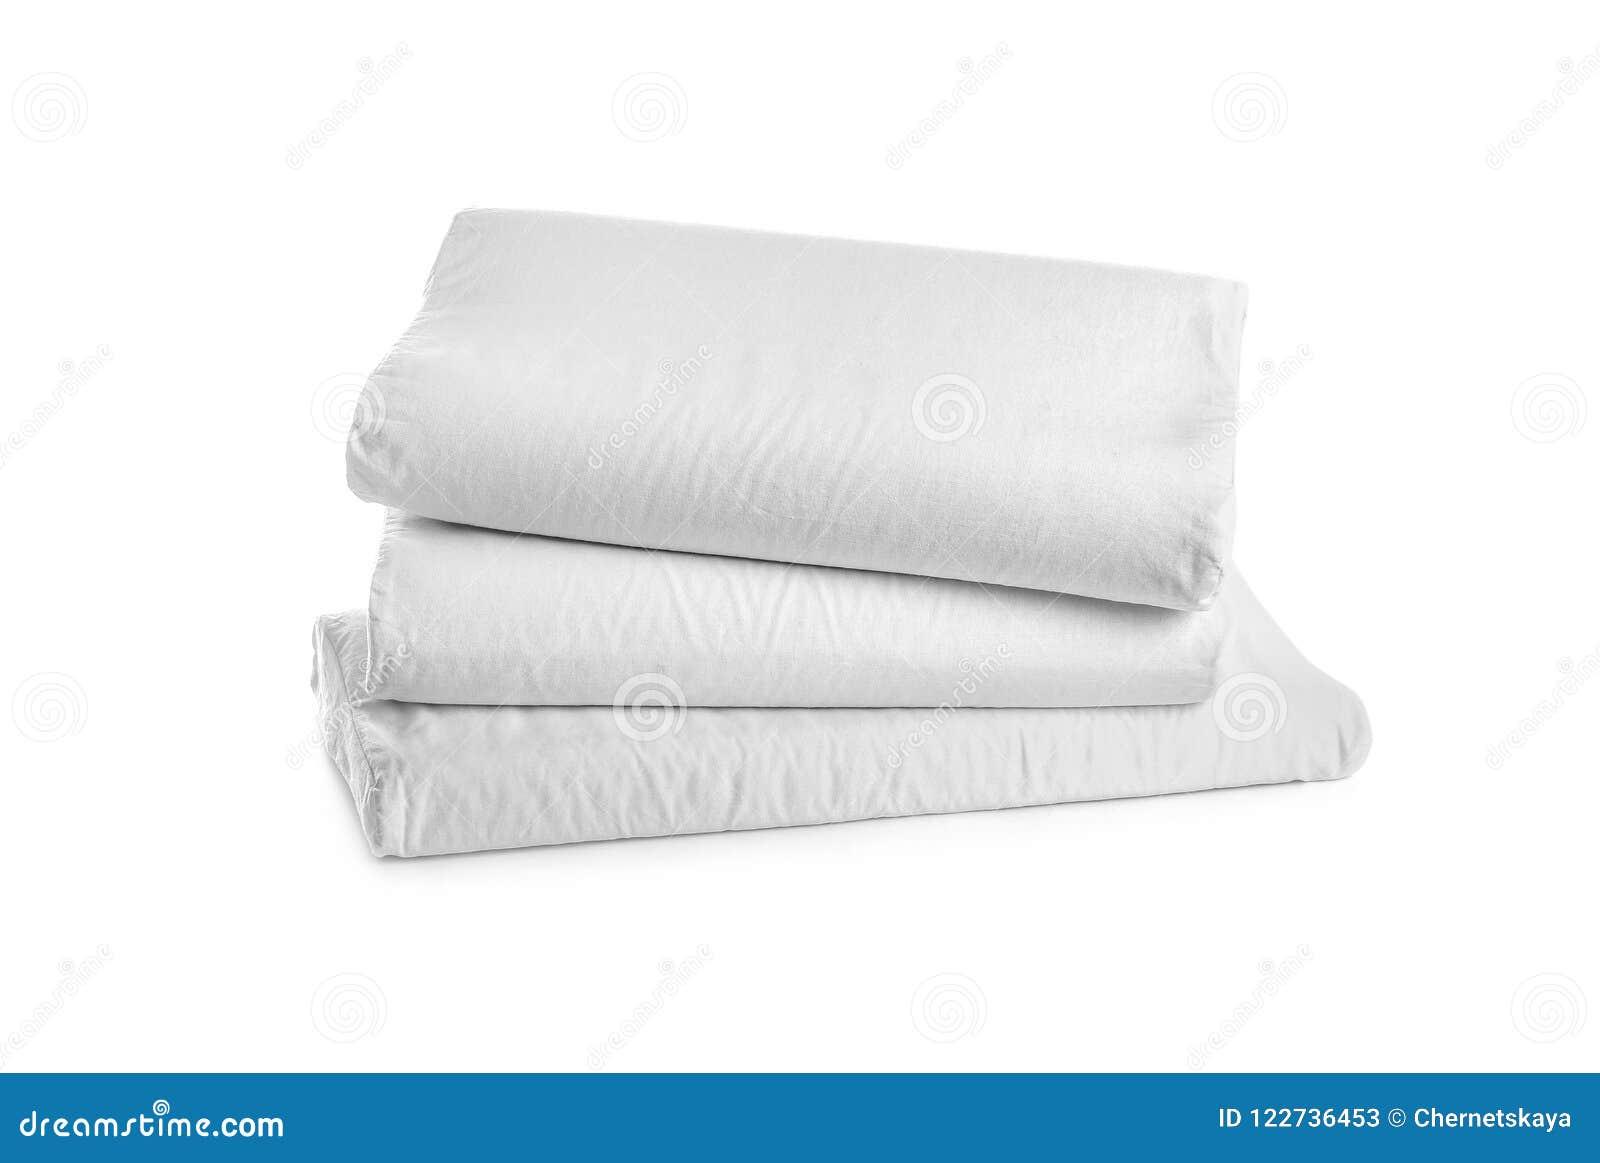 Clean soft orthopedic pillows